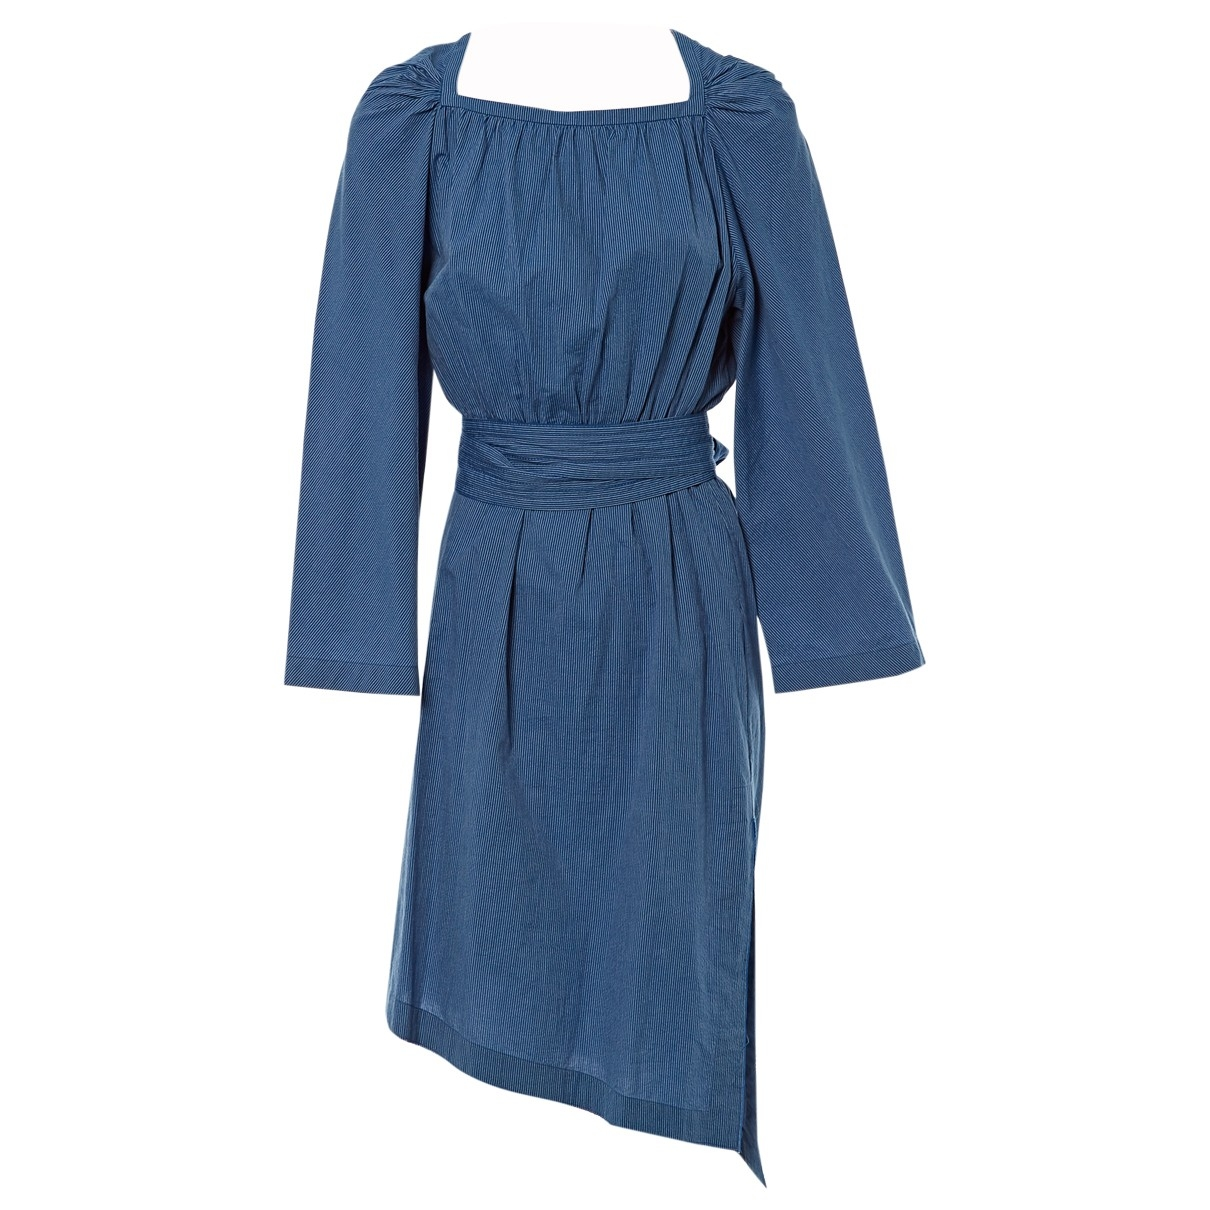 Loewe \N Blue Cotton dress for Women 38 FR